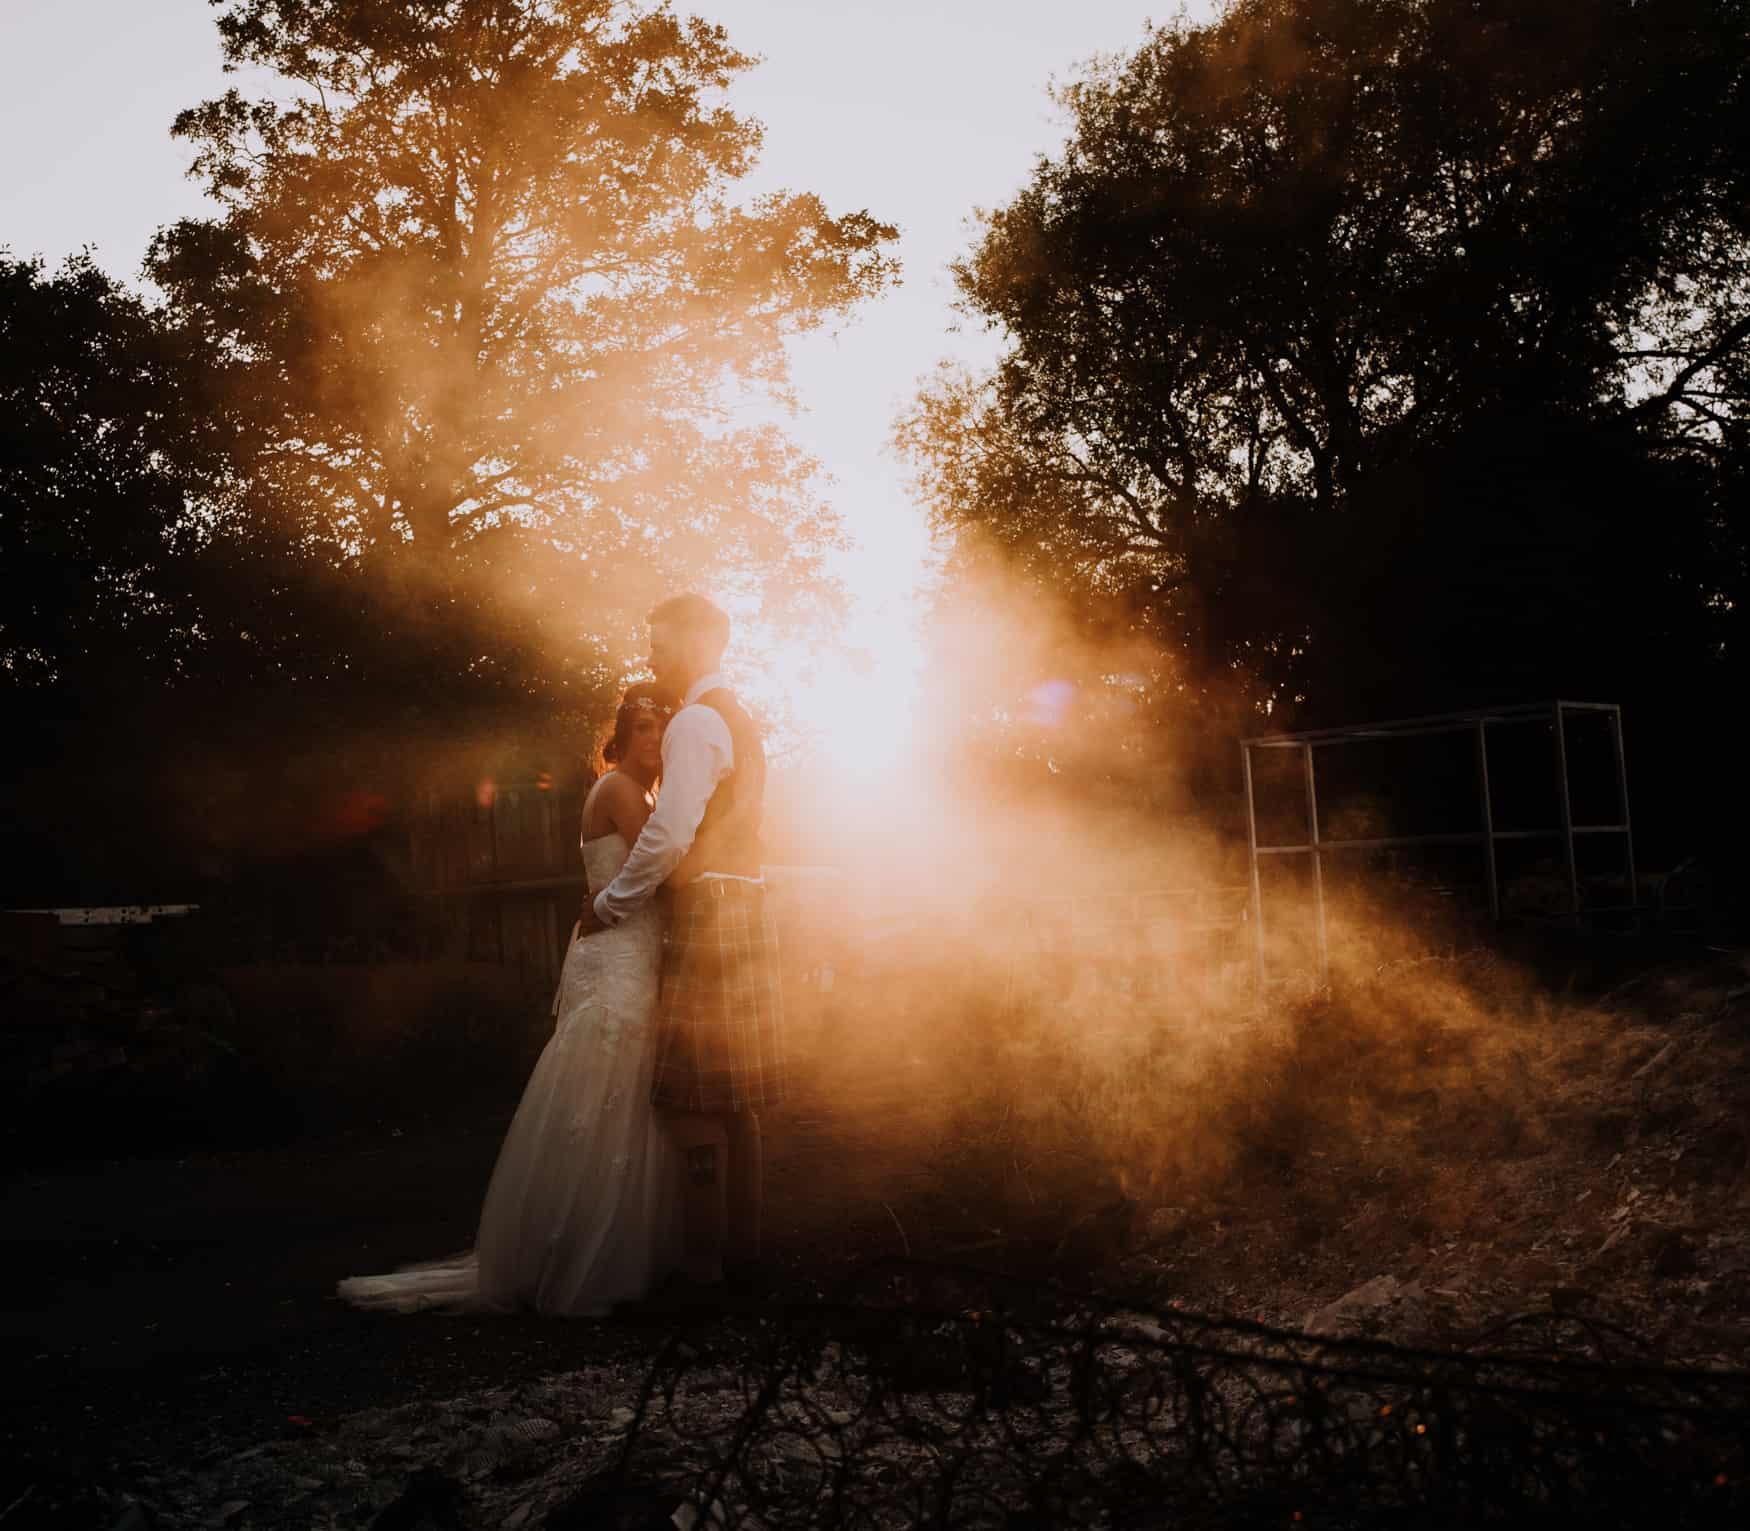 Bride and groom sunset with smoke